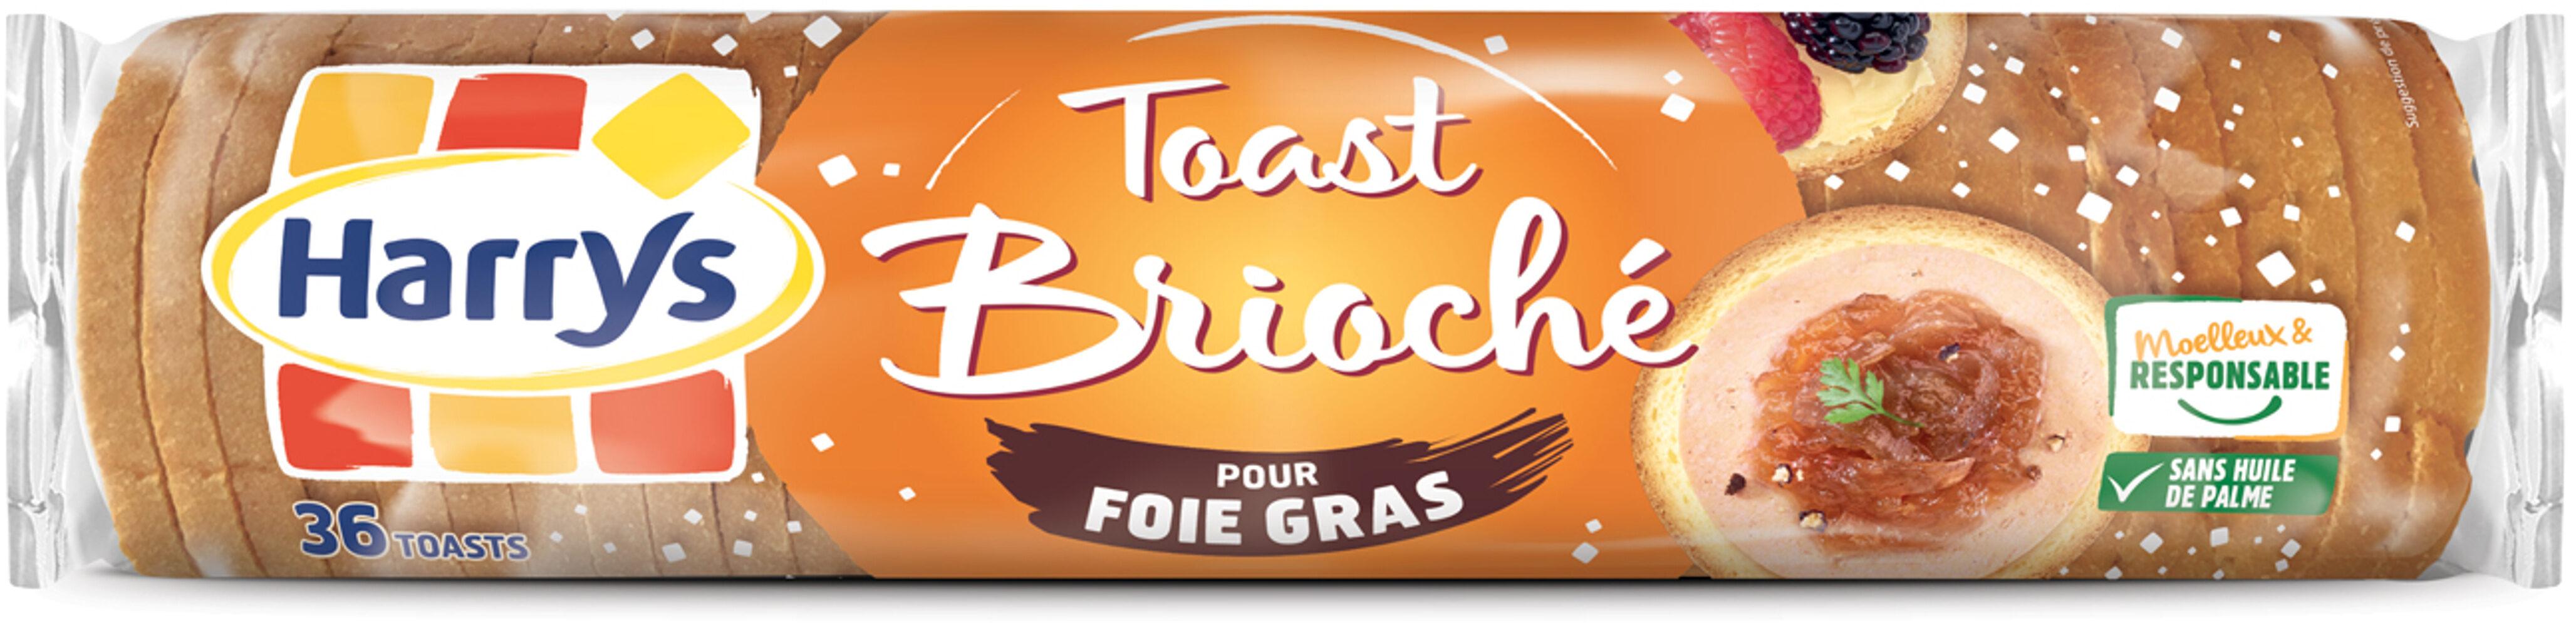 Toast foie gras 280g - Produit - fr